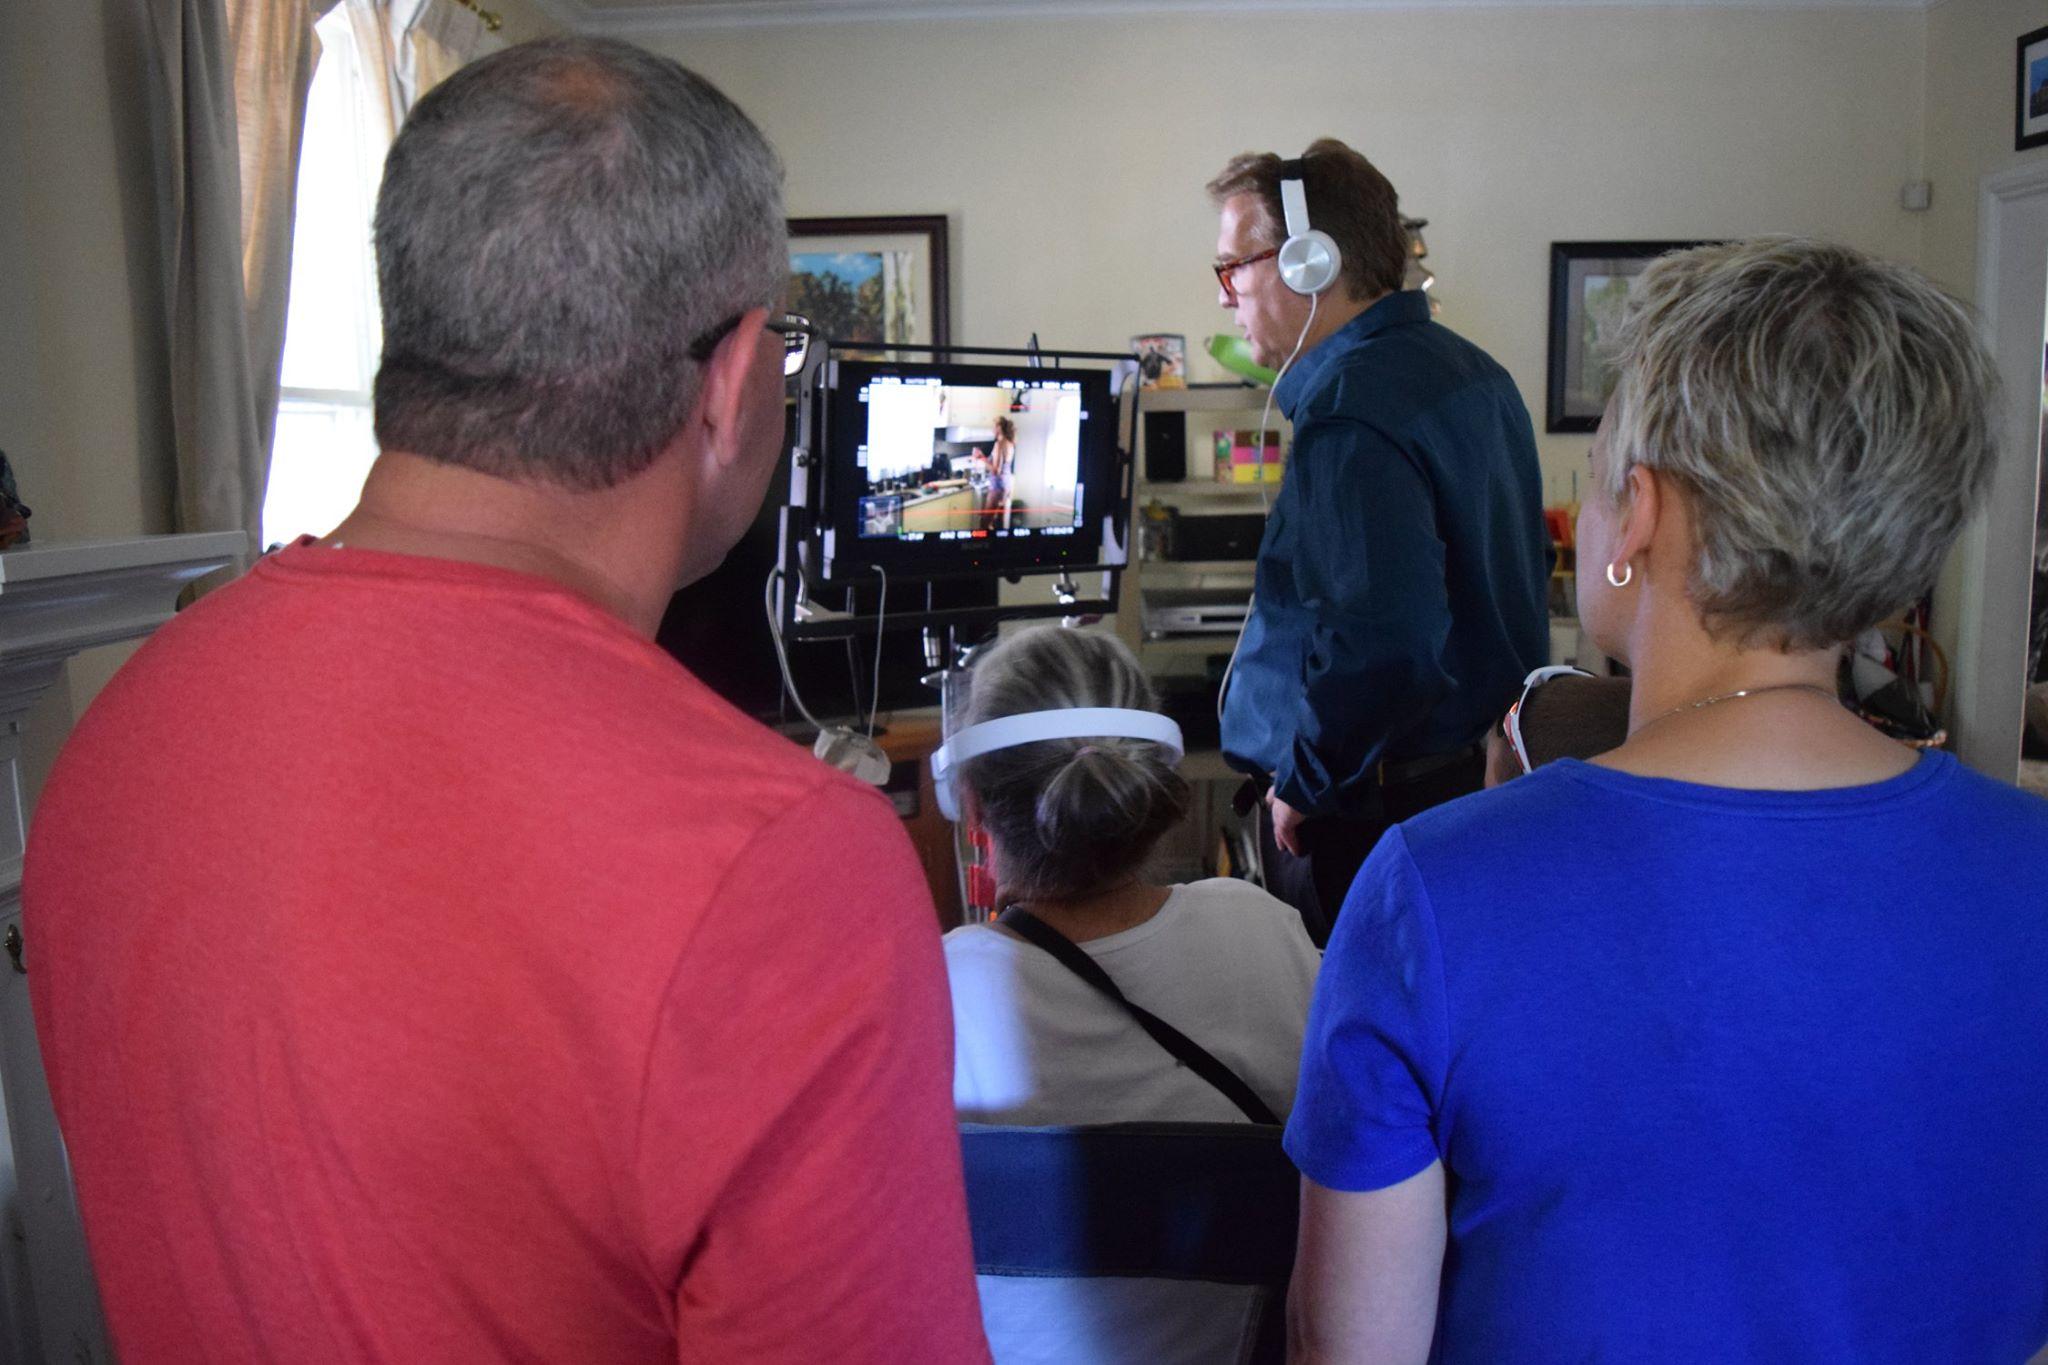 Directing